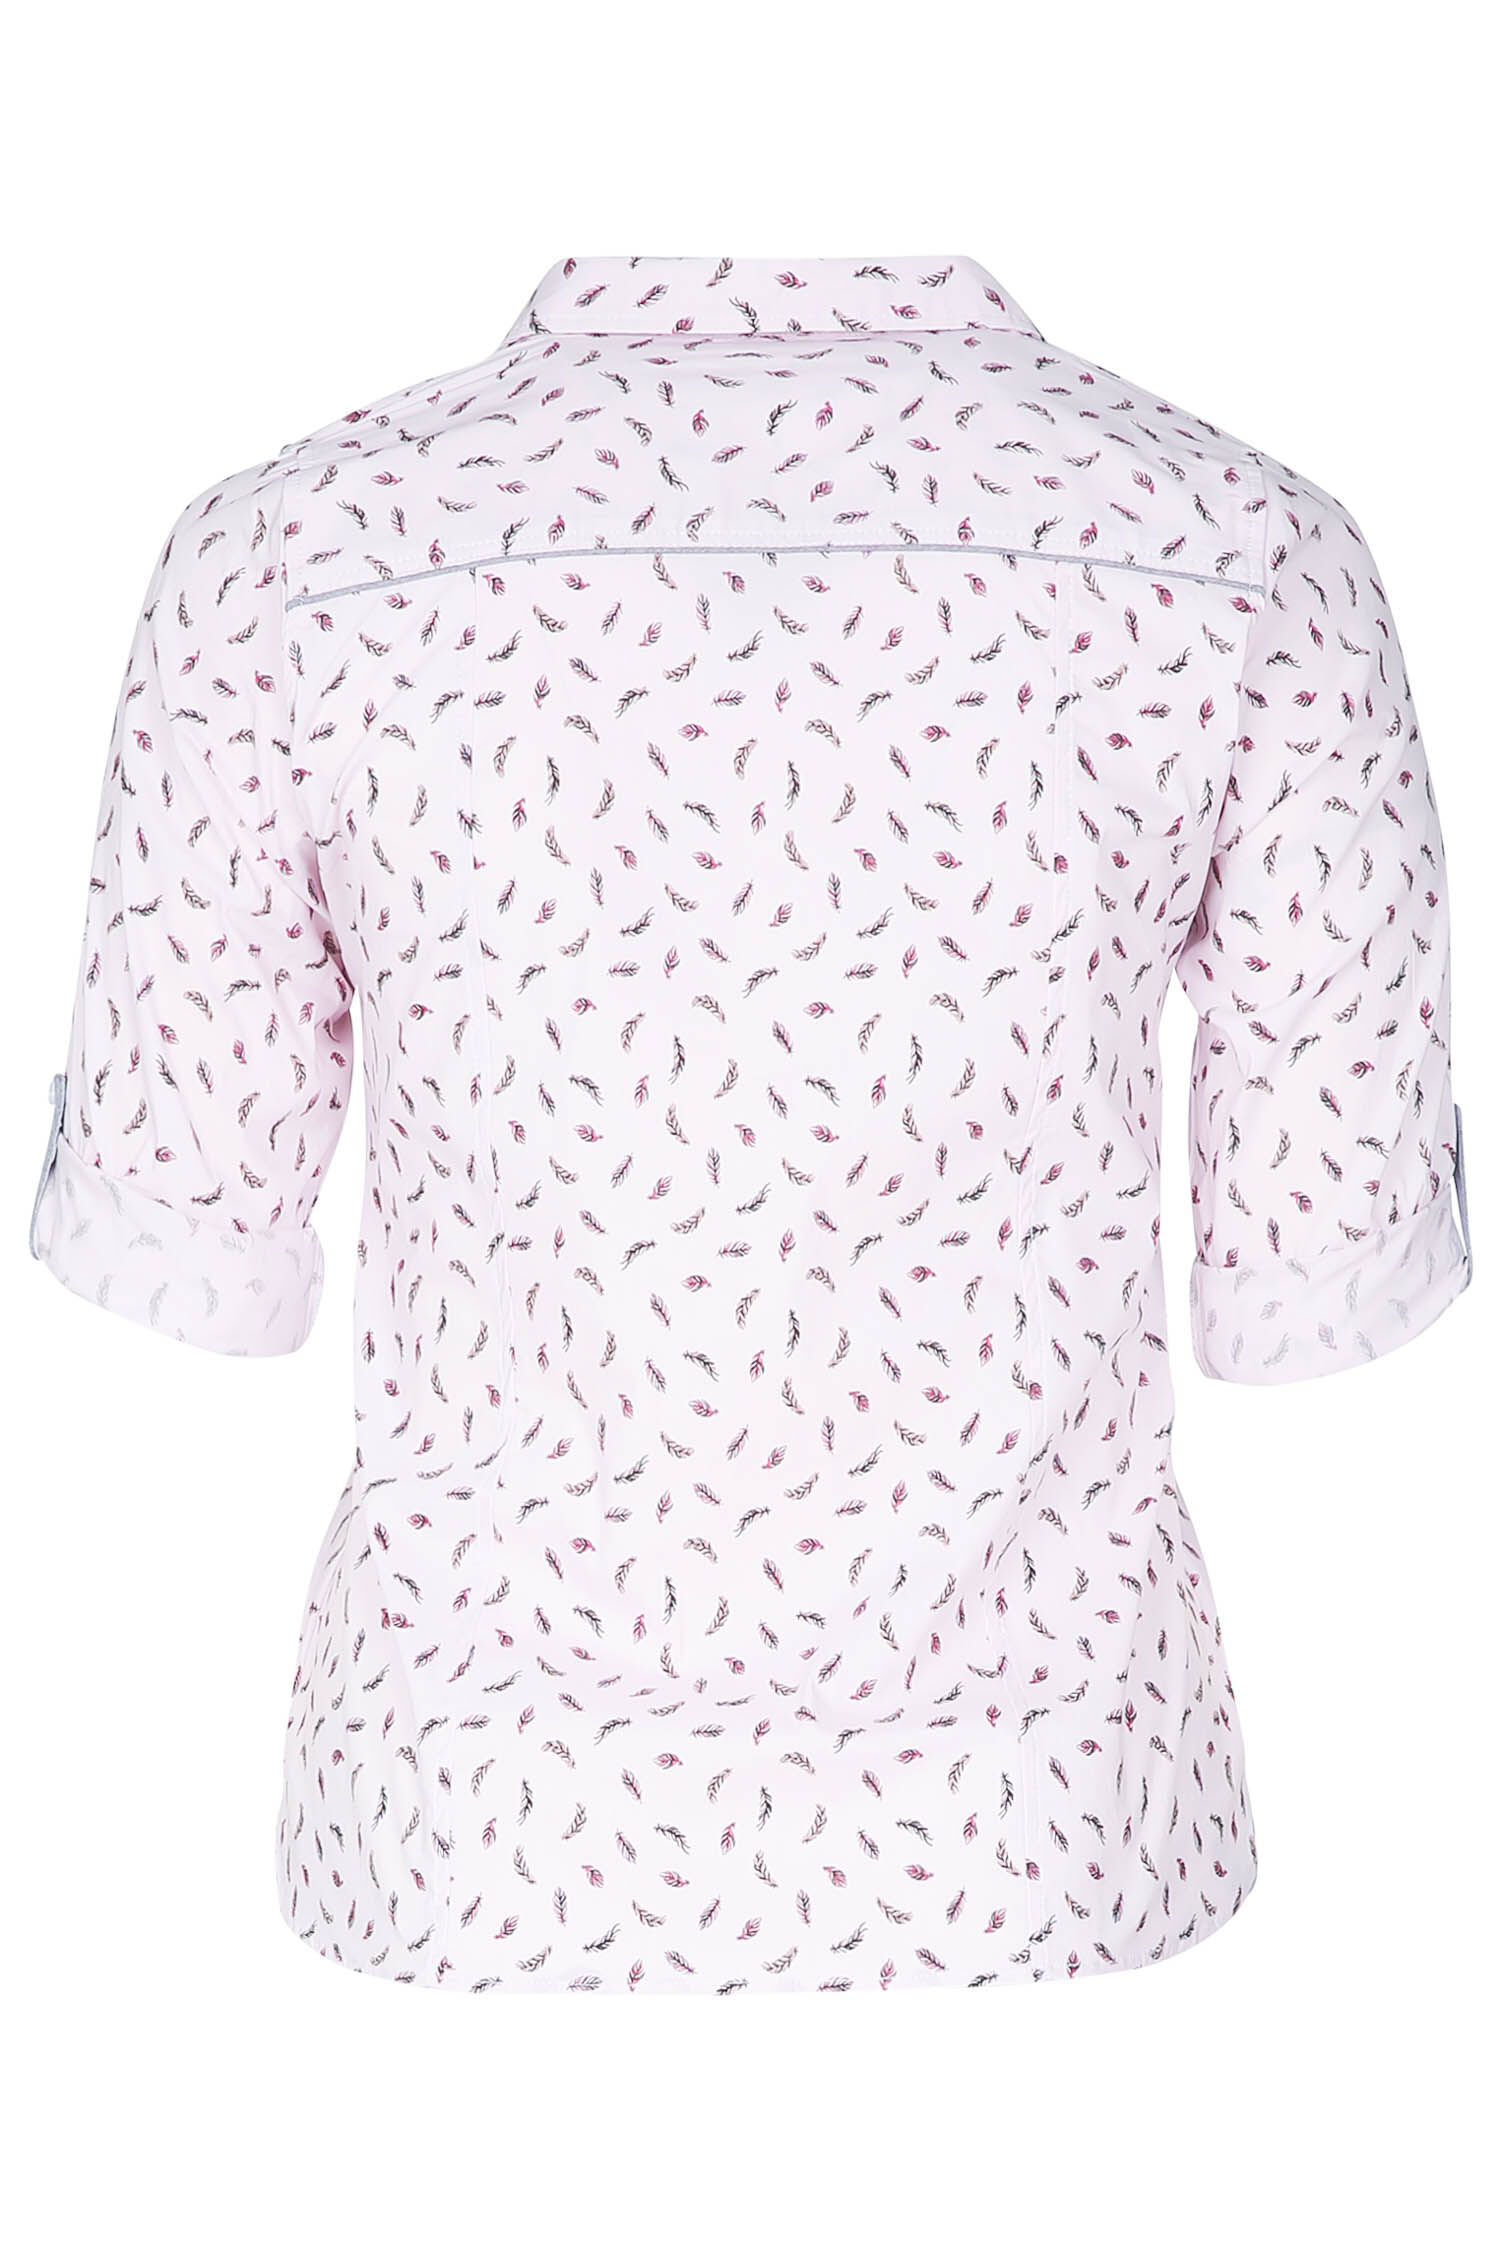 Bluse mit Feder Print